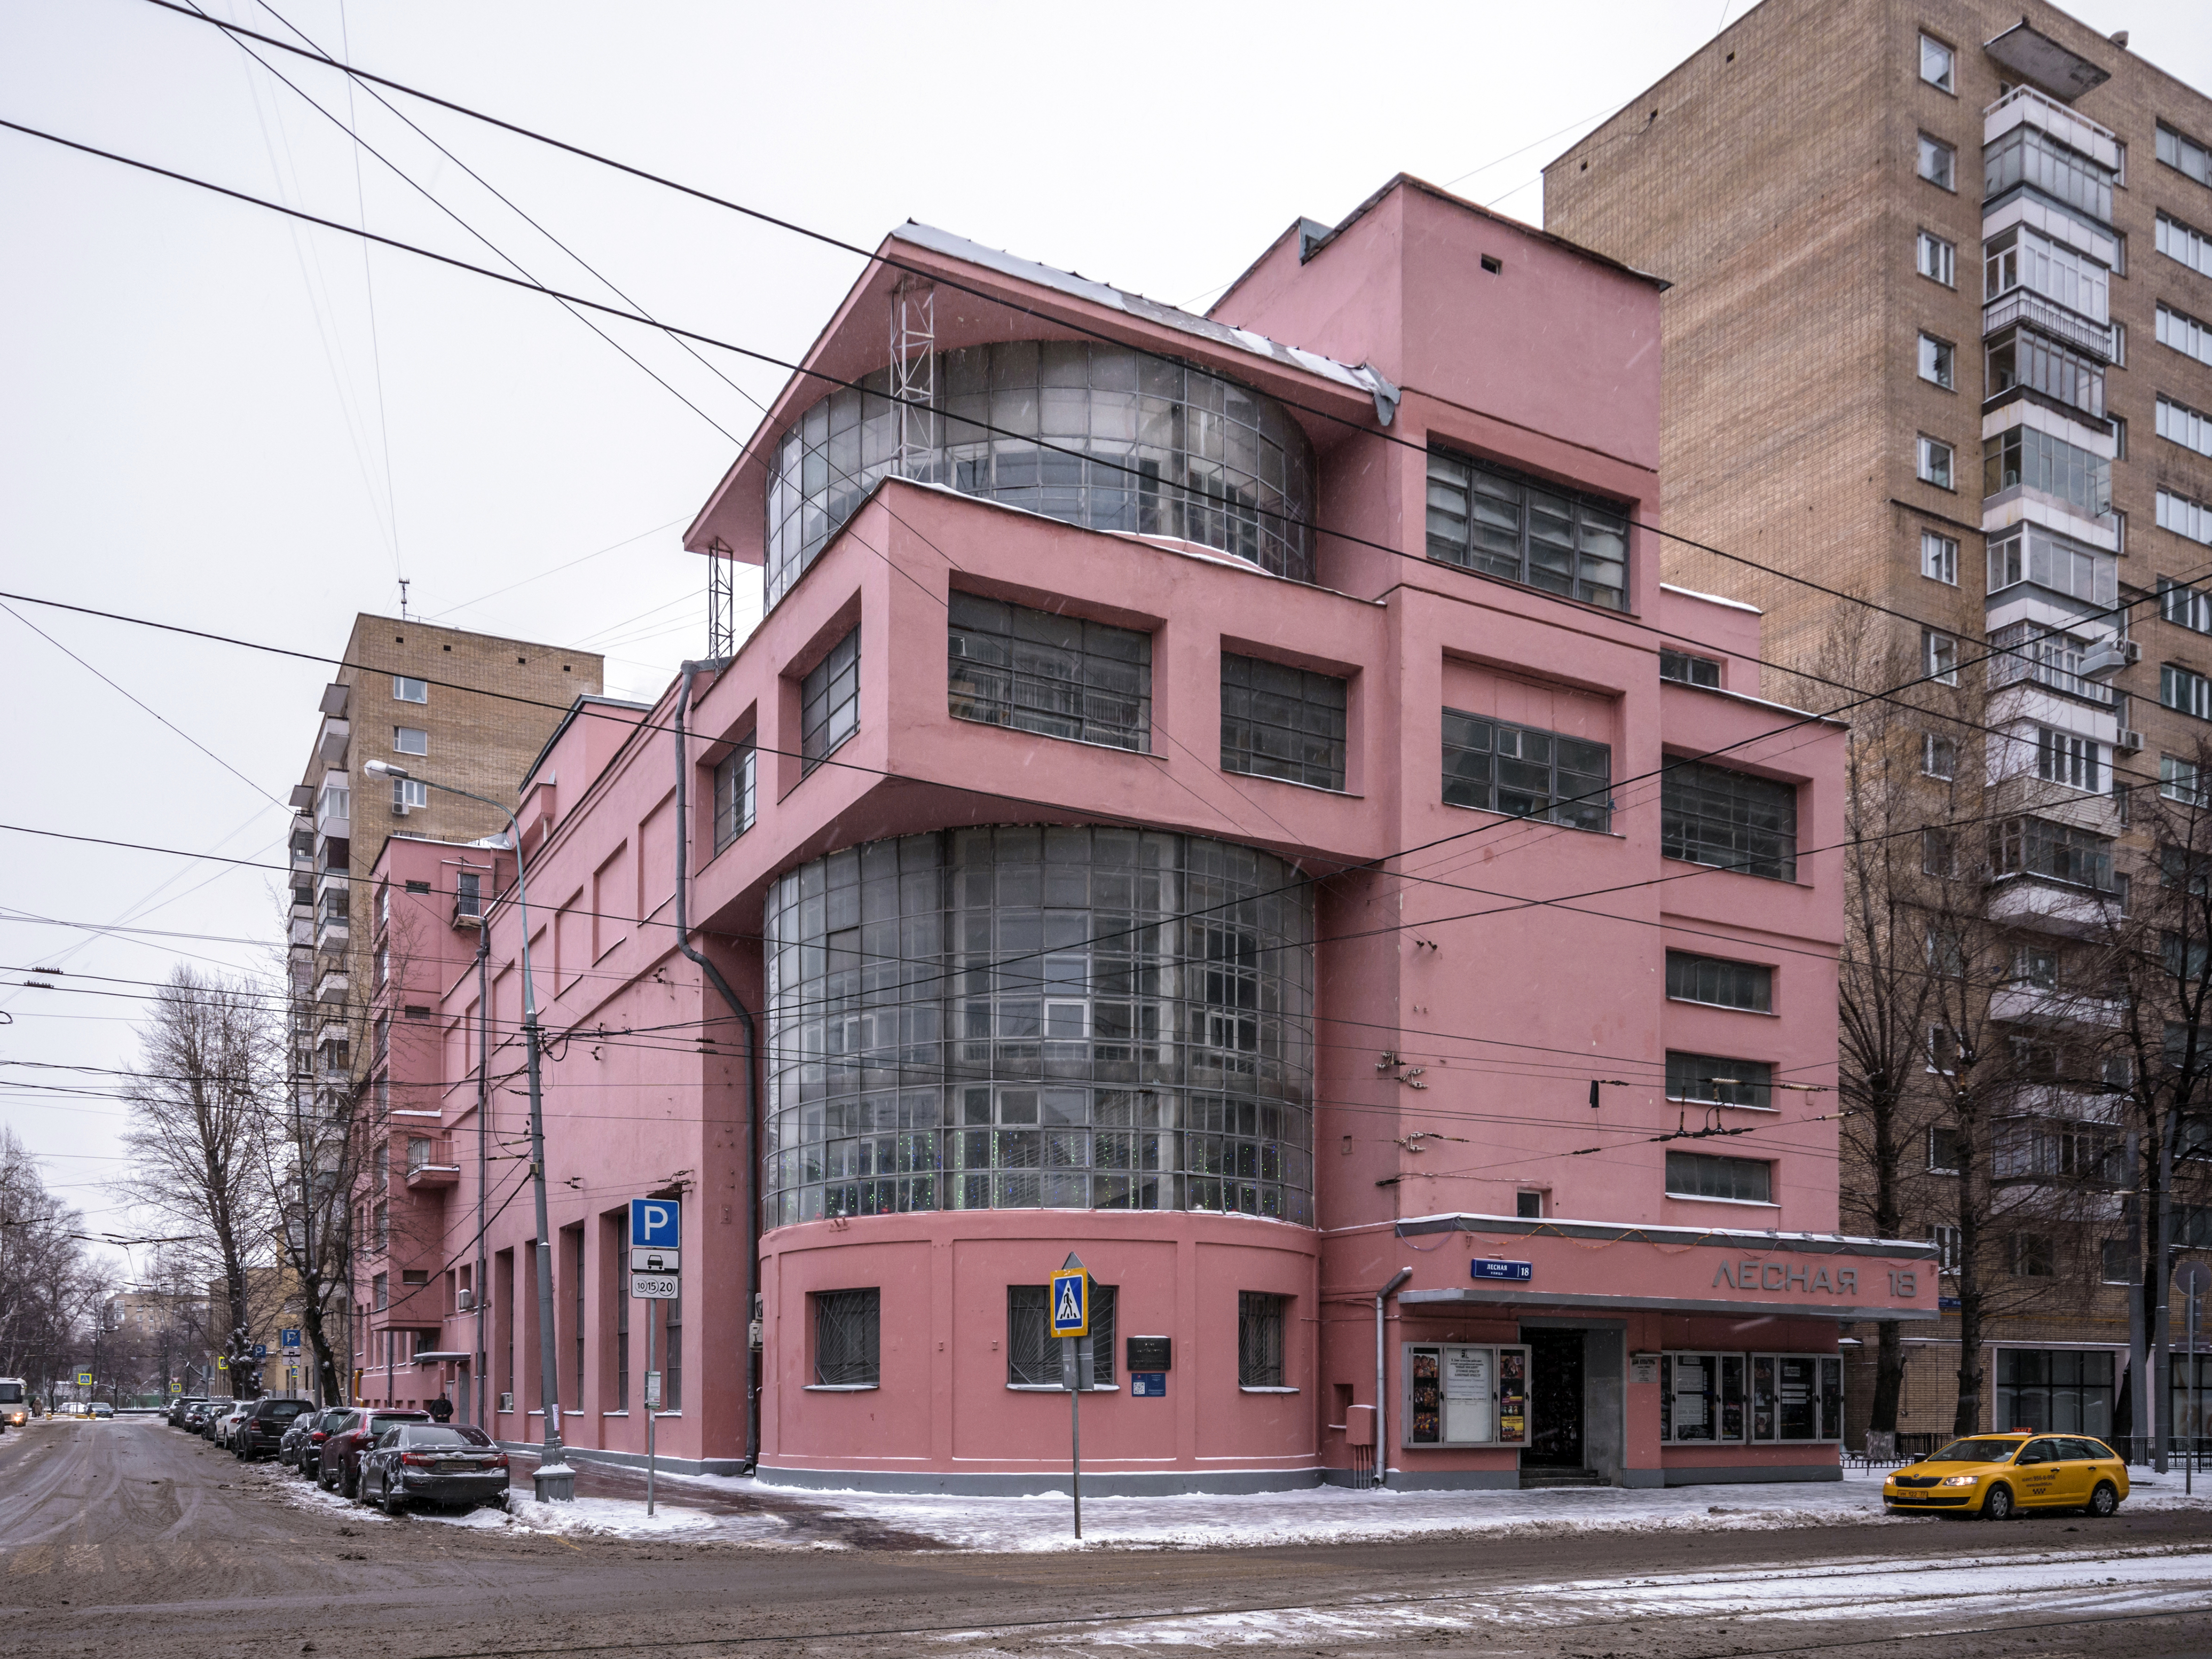 Клуб пауэр хаус москва клуб дягилев адрес москва